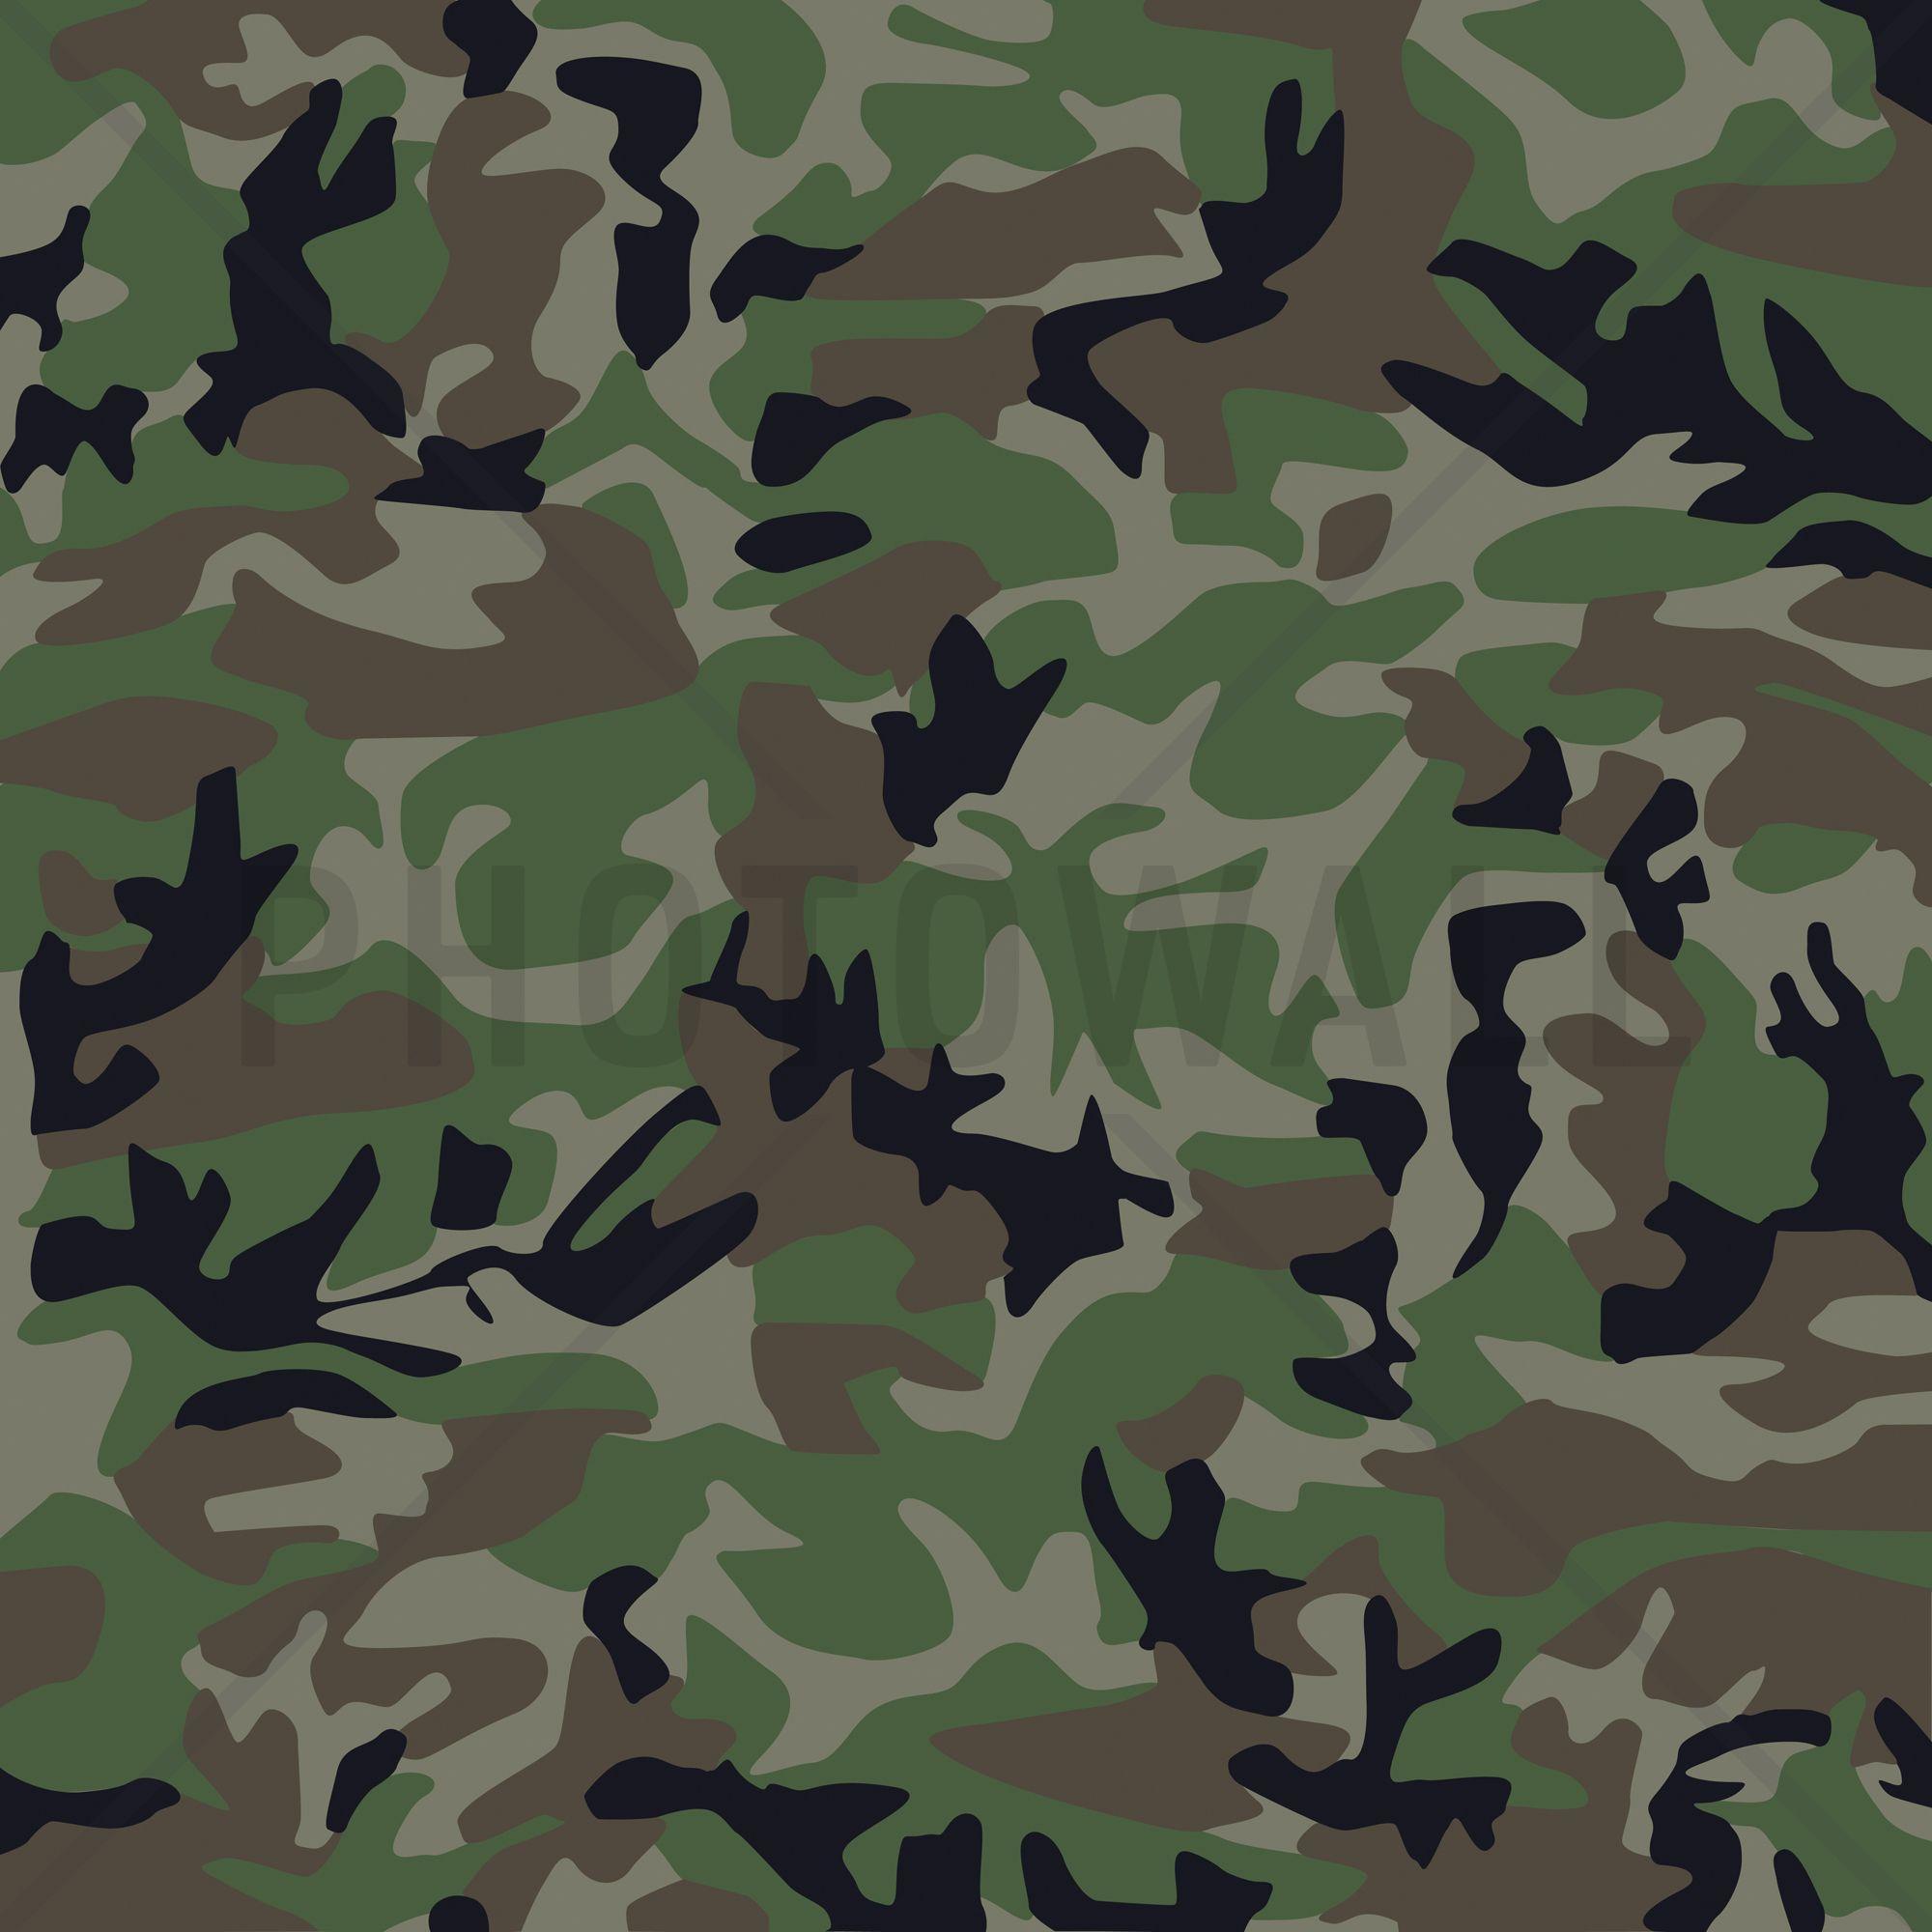 Camouflage Wall Mural & Photo Wallpaper Photowall